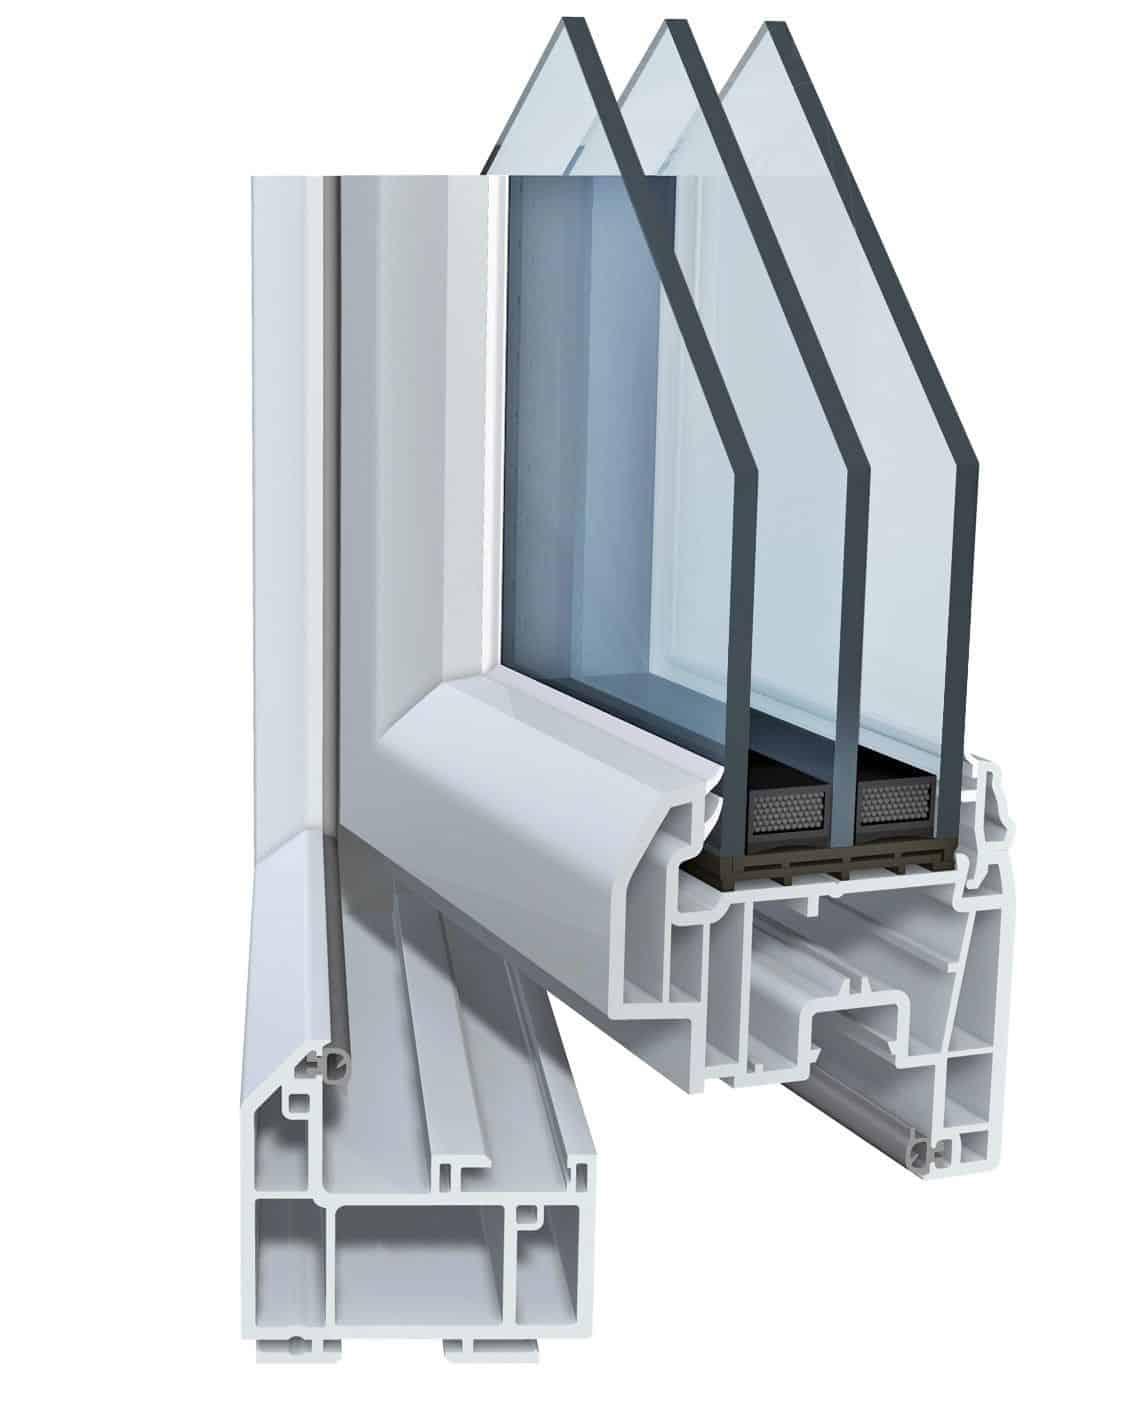 Triple vitrage fenêtre